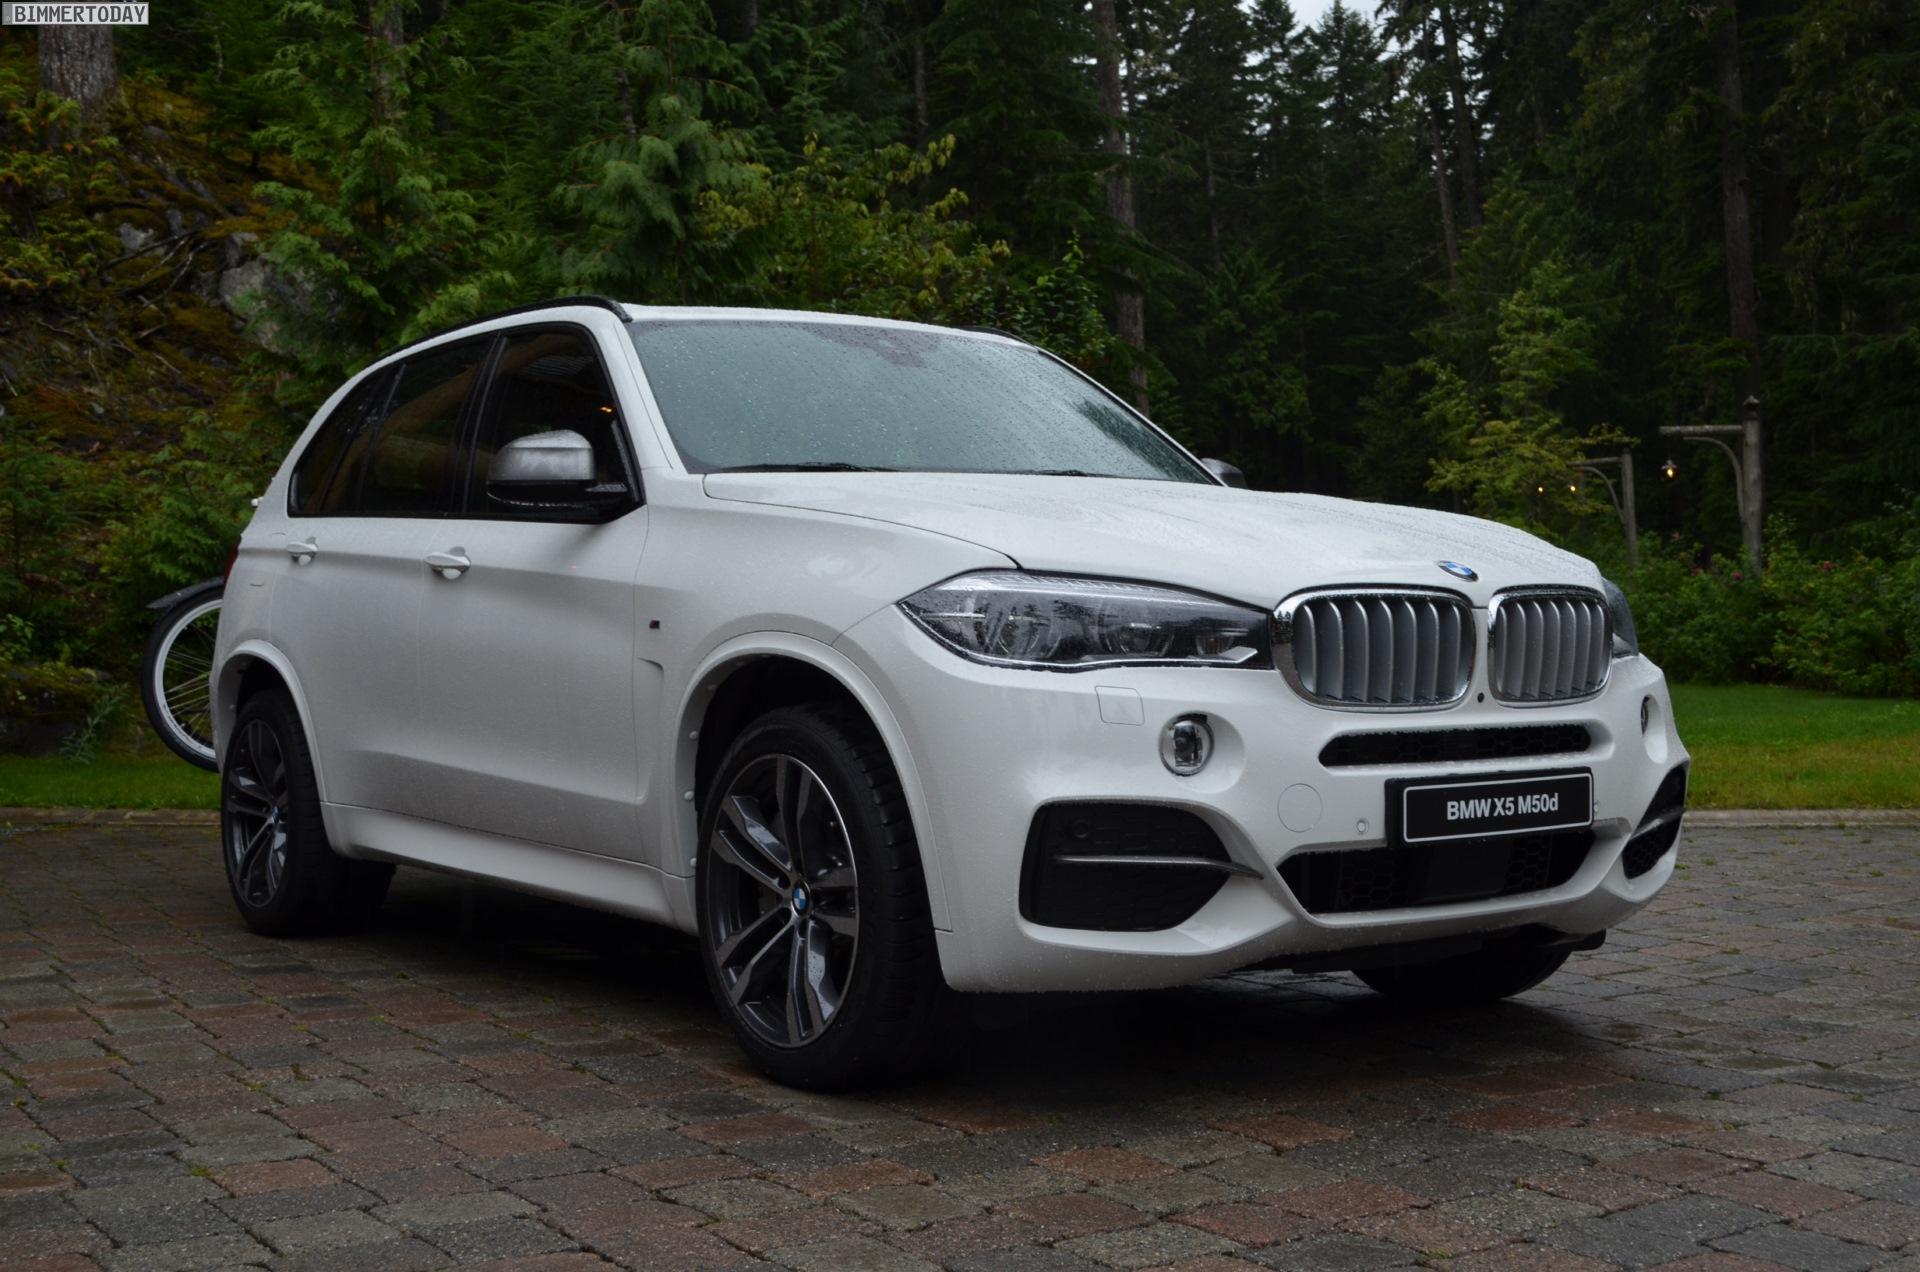 2014 BMW X5 M50d F15 M Sportpaket weiss Triturbo Diesel SUV 01